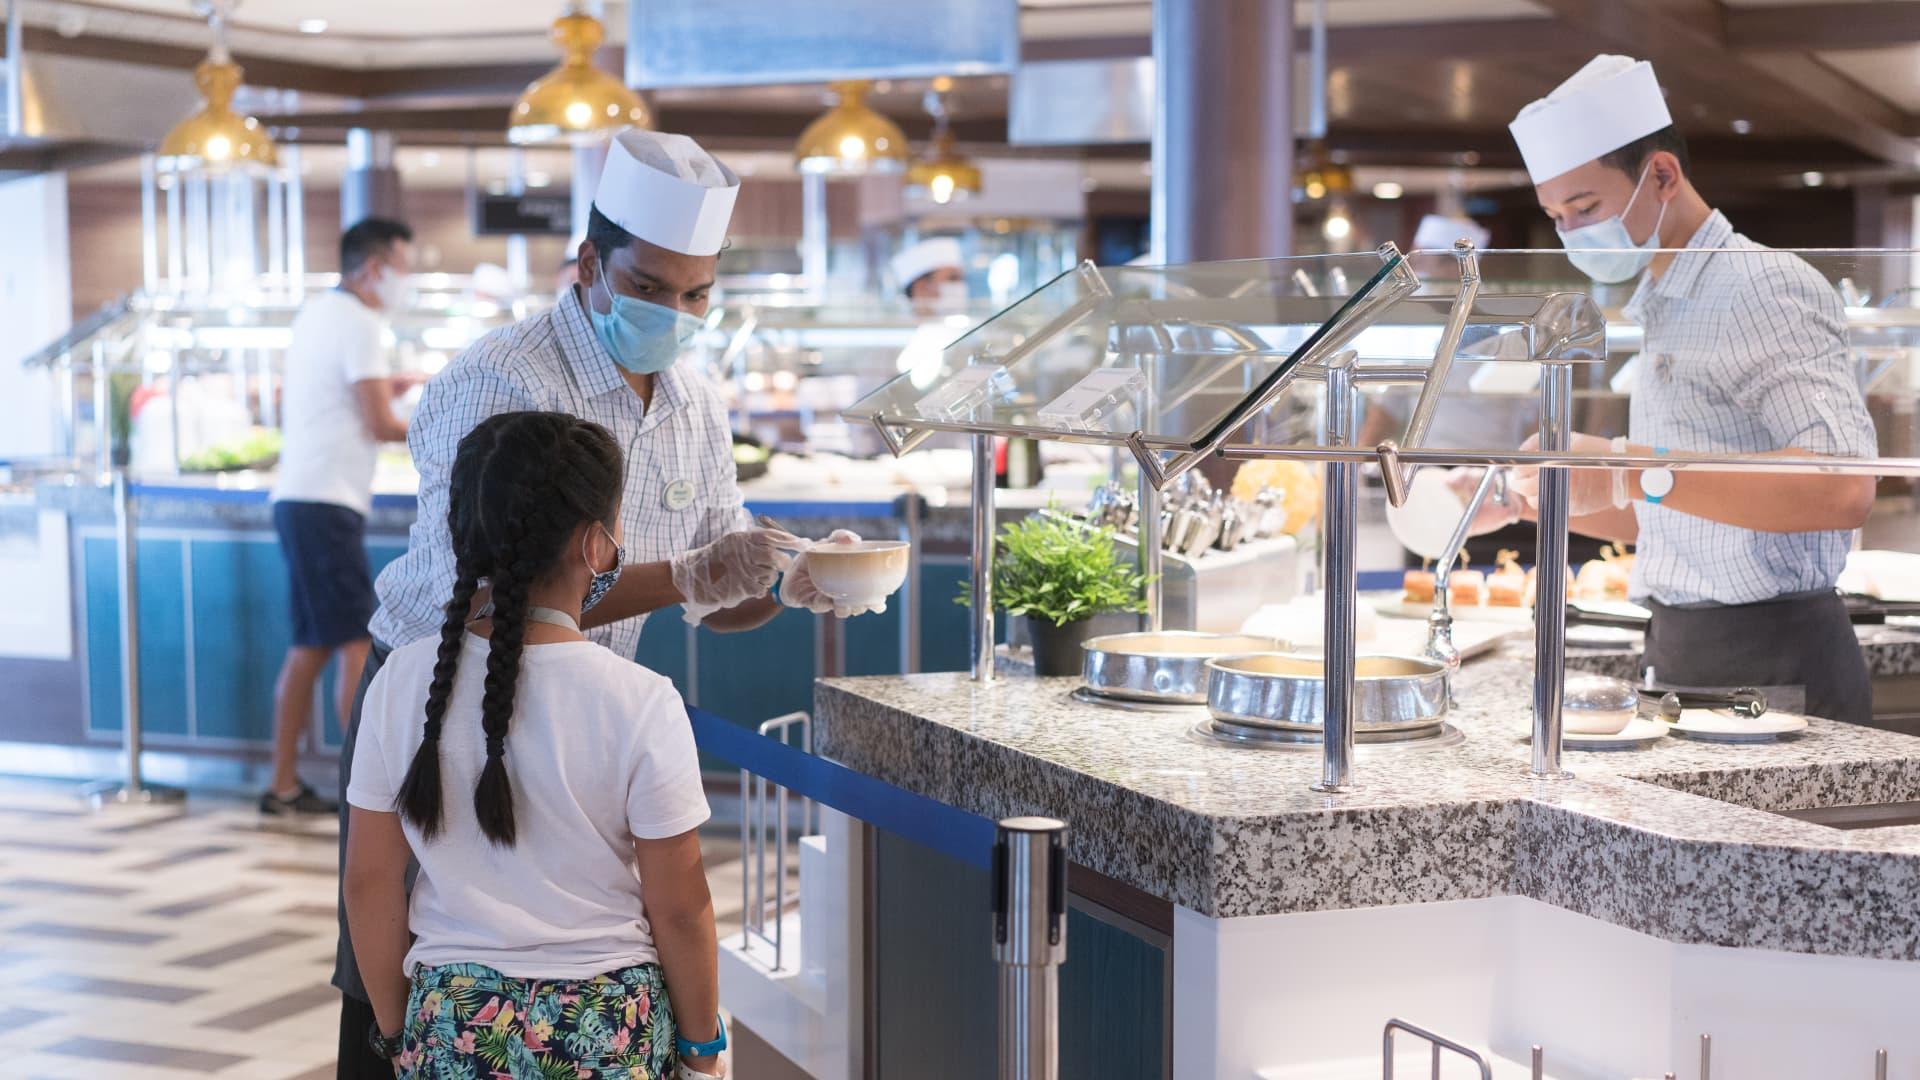 A buffet on Royal Caribbean's Odyssey of the Seas ship